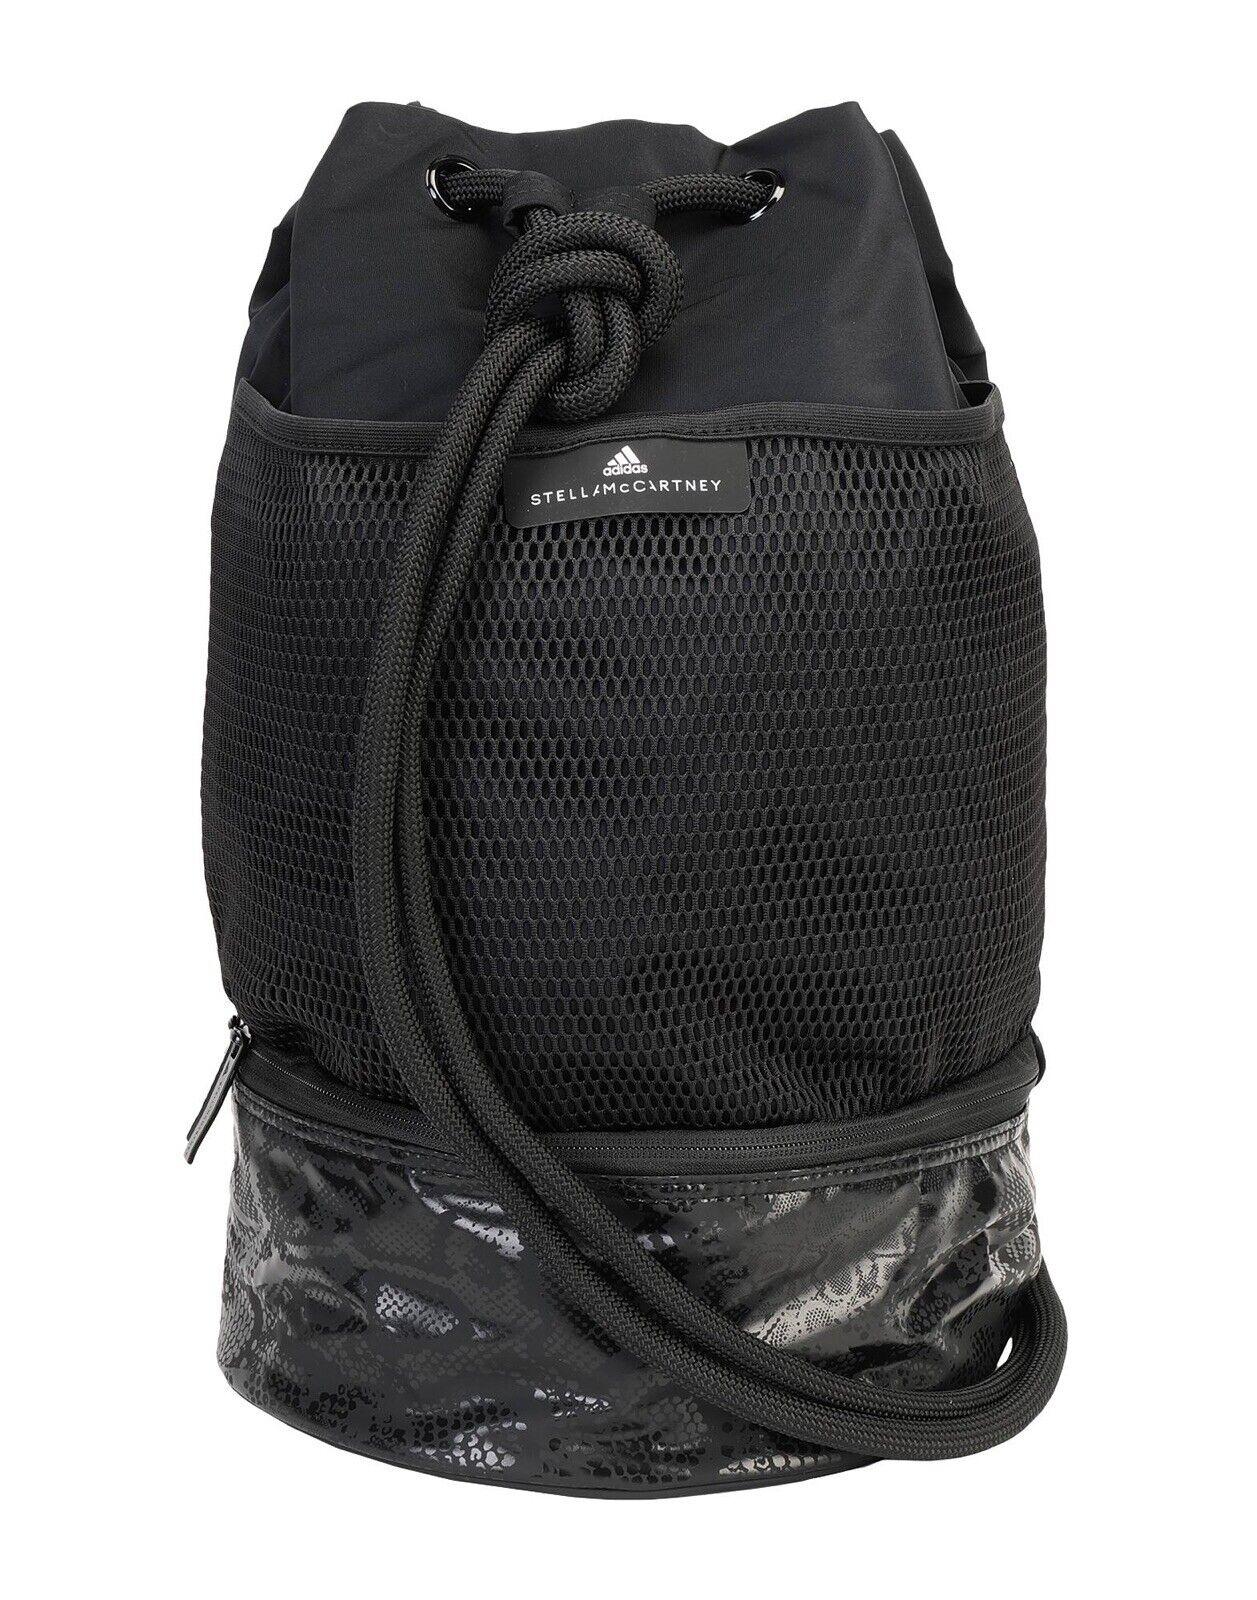 Stella McCartney x Adidas Black Gym Sack Athleisure Boxing Backpack Shoulder Bag